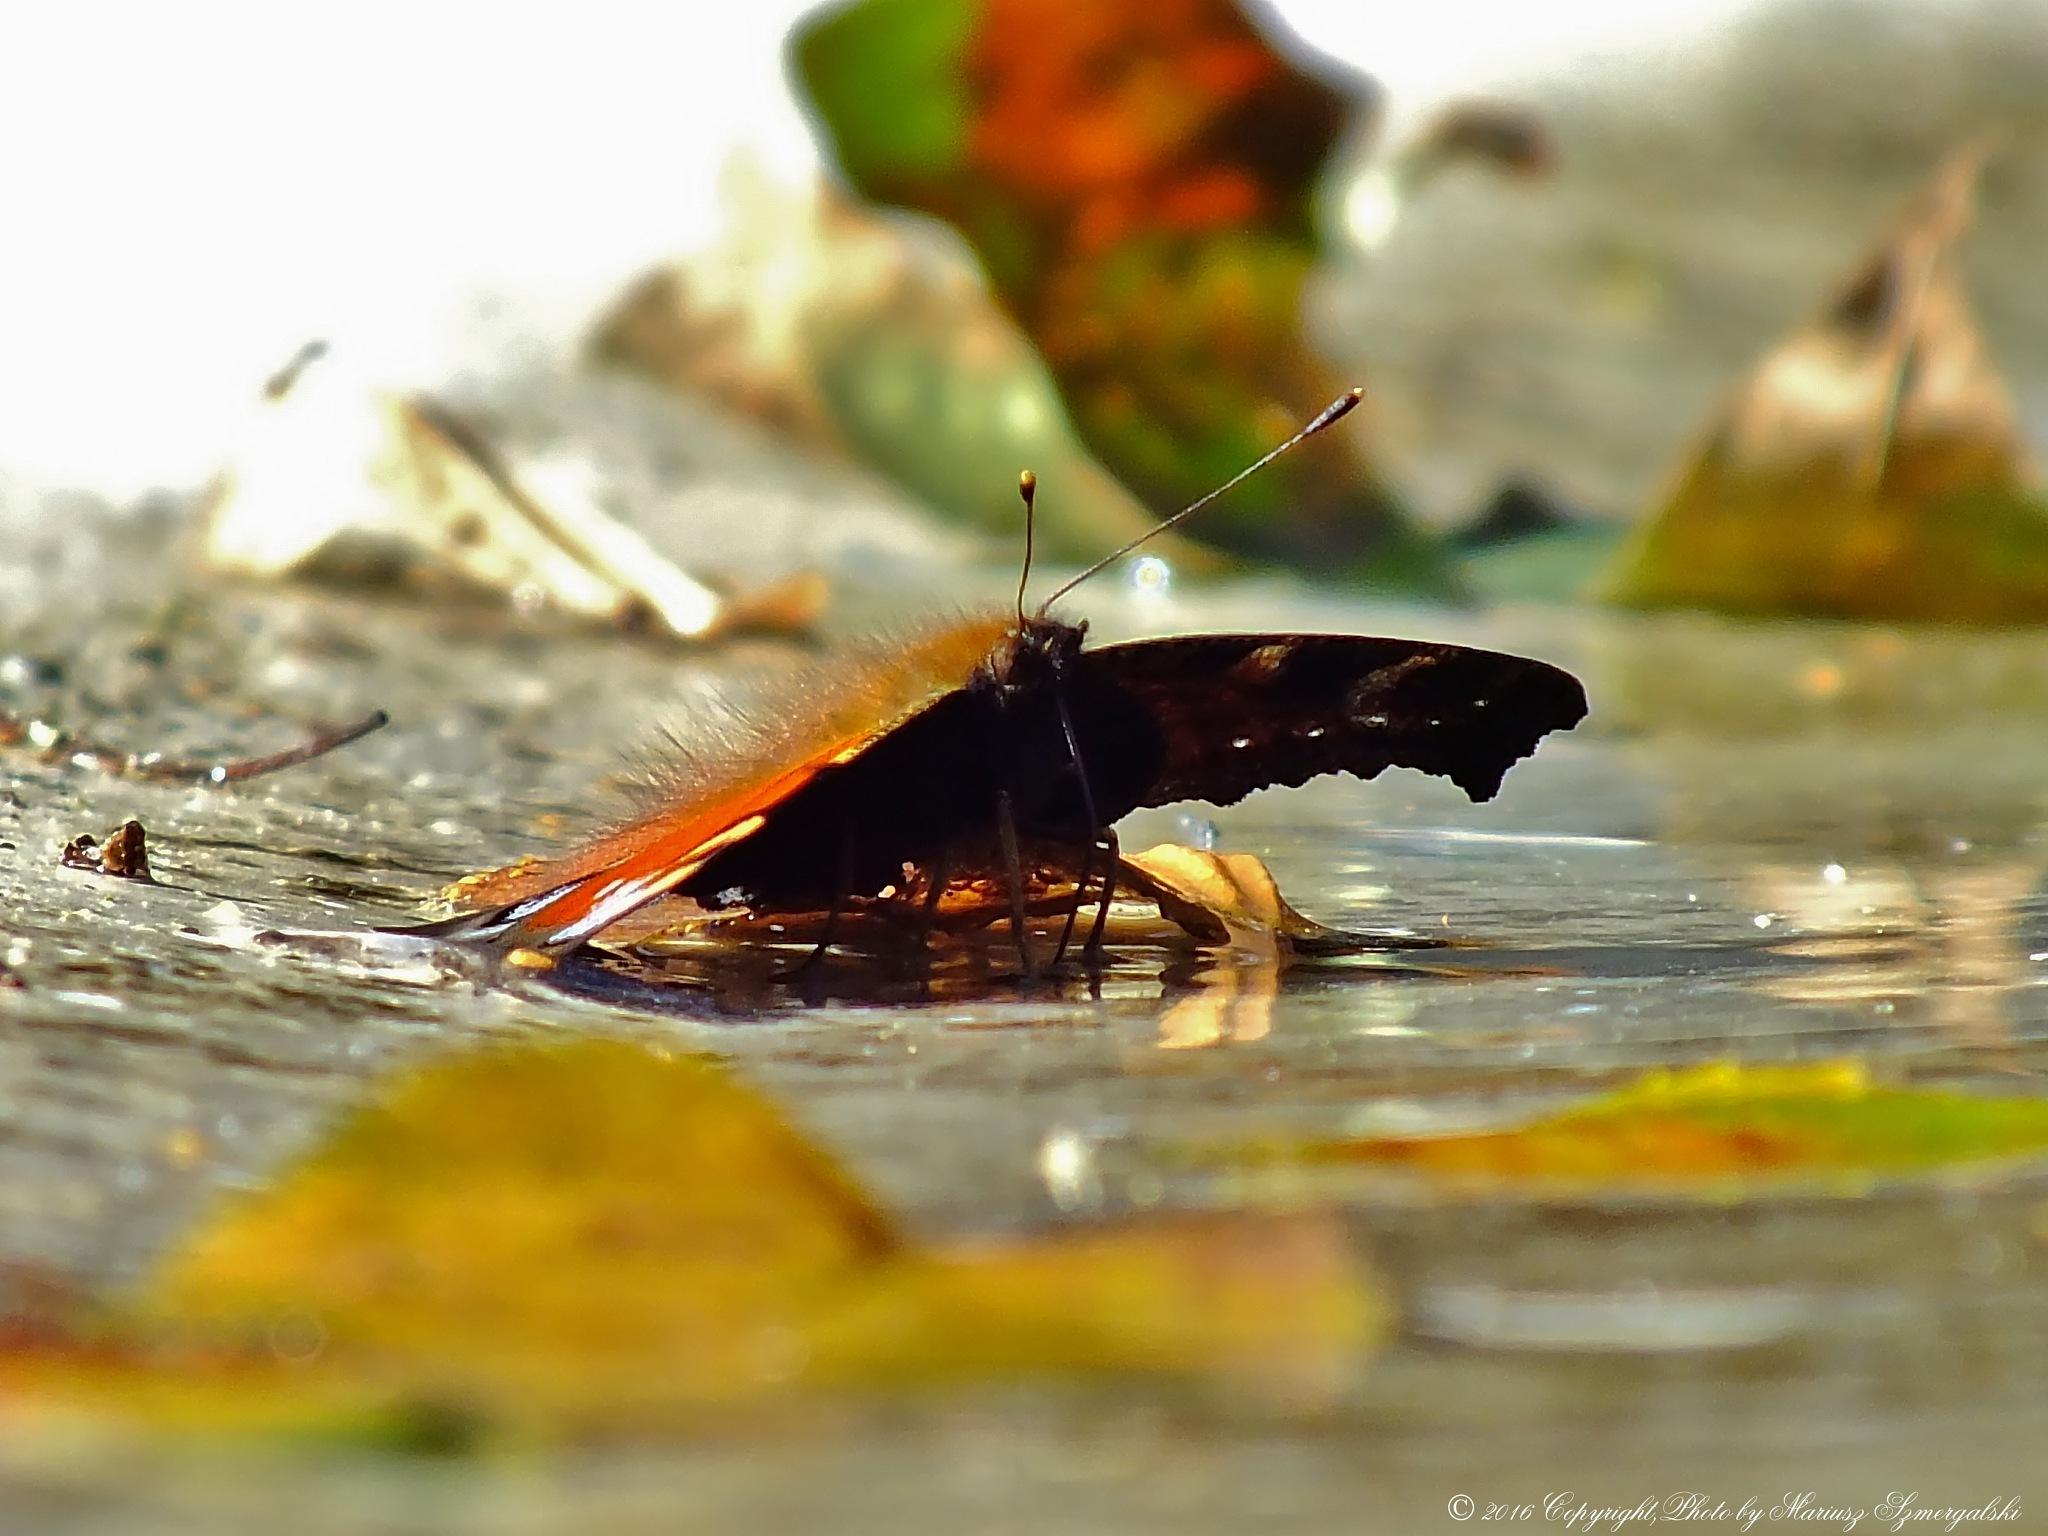 Bather on the water. by jon.rambo.37819